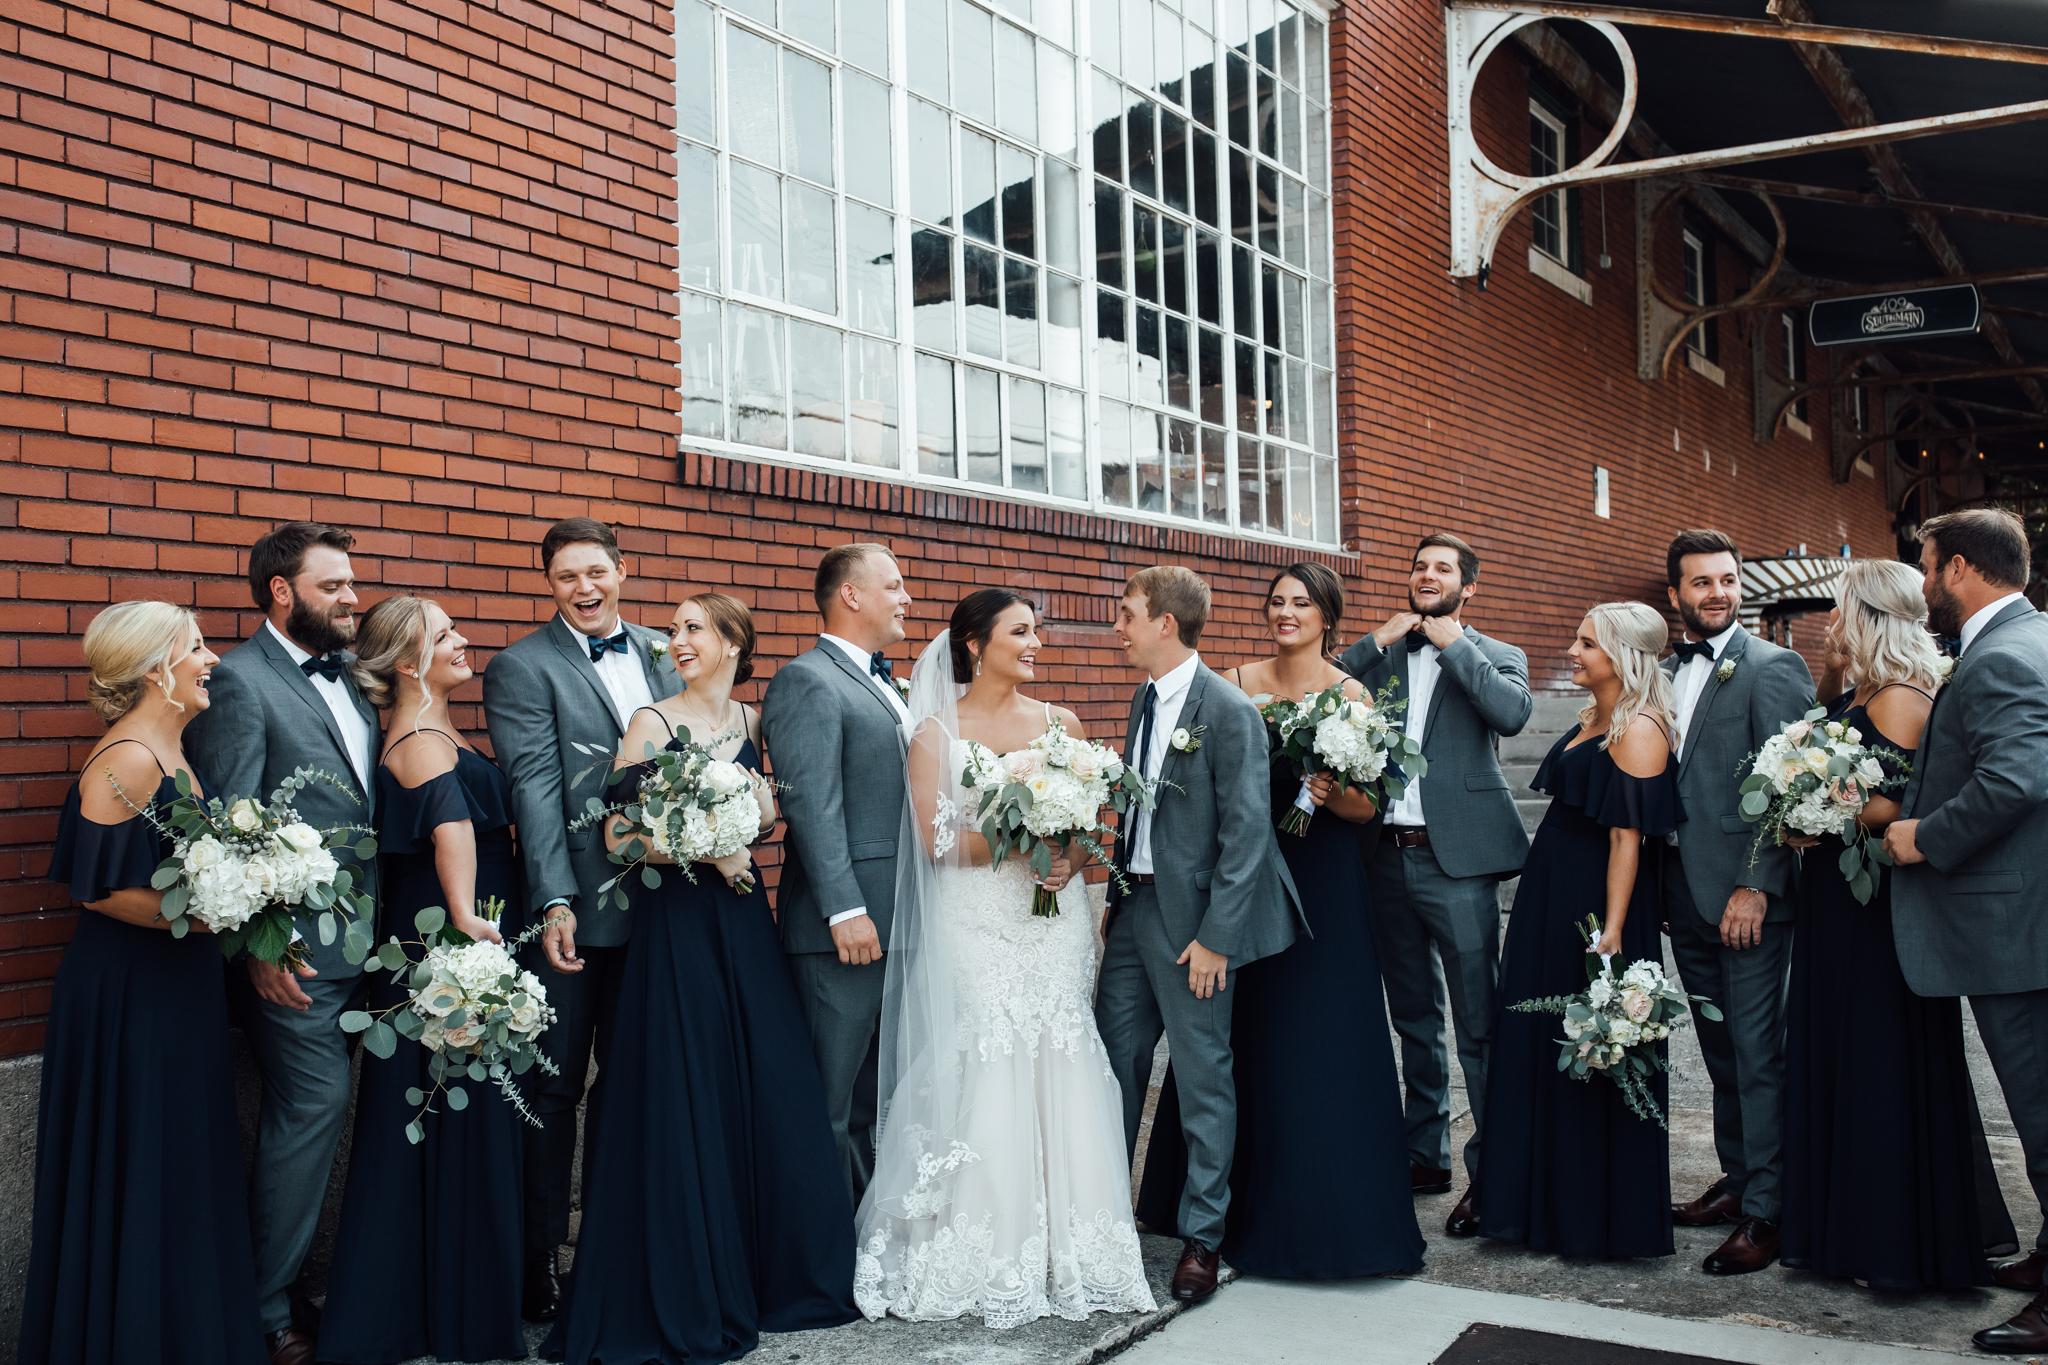 409smain-downtown-memphis-wedding-venue-thewarmtharoundyou (47 of 243).jpg